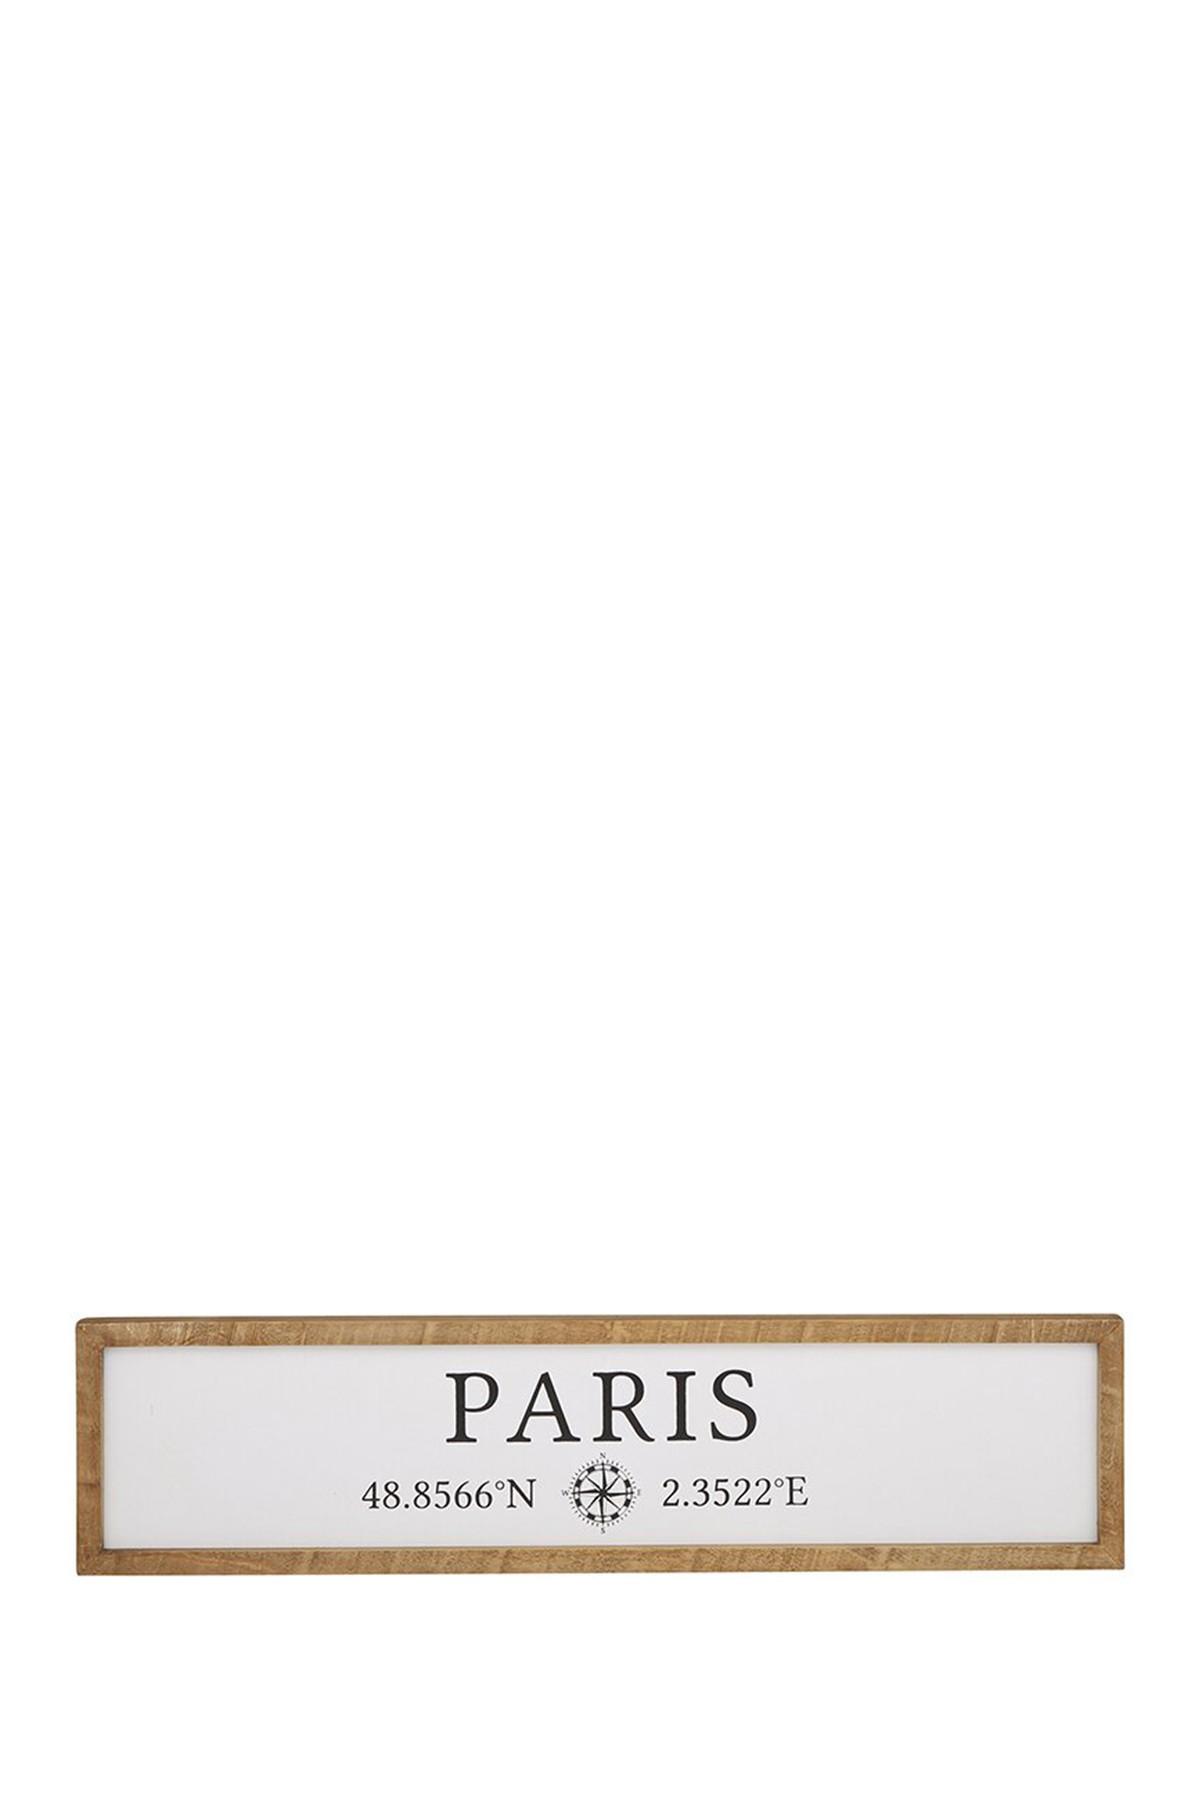 CREATIVE BRANDS Paris Wood Frame $14.97